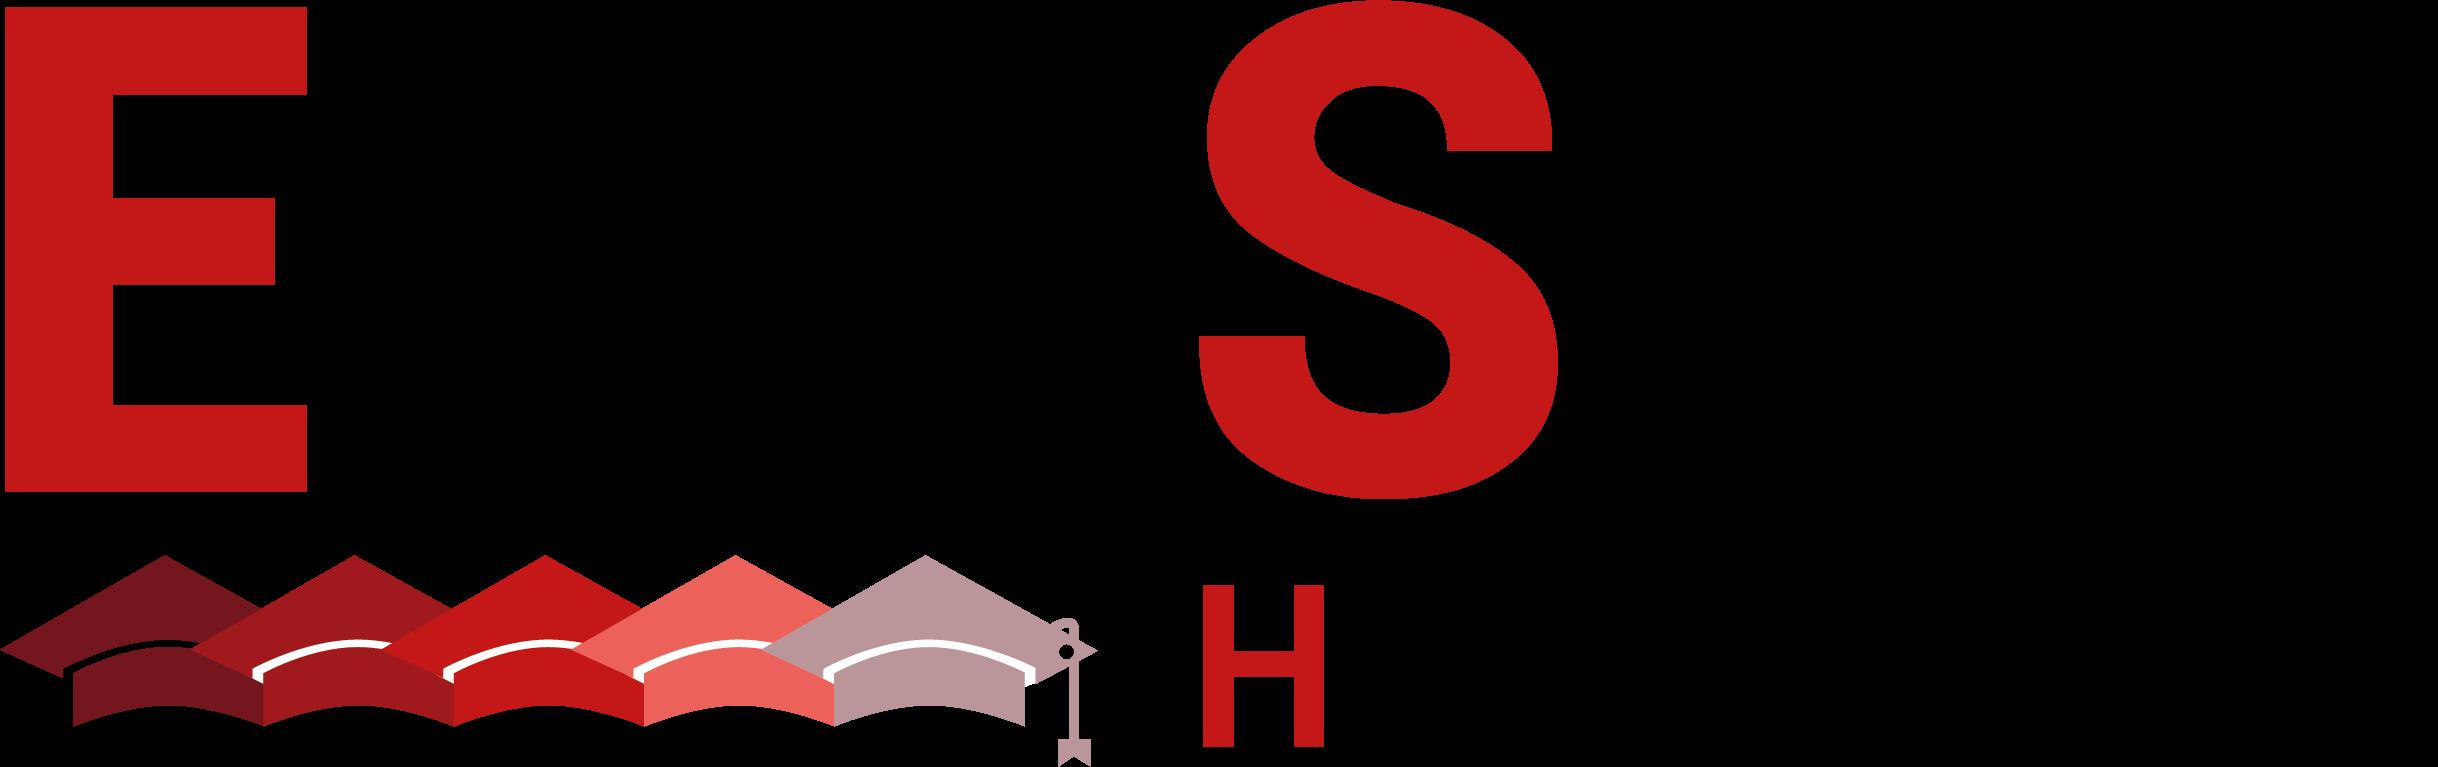 EcoSup Hôtellerie